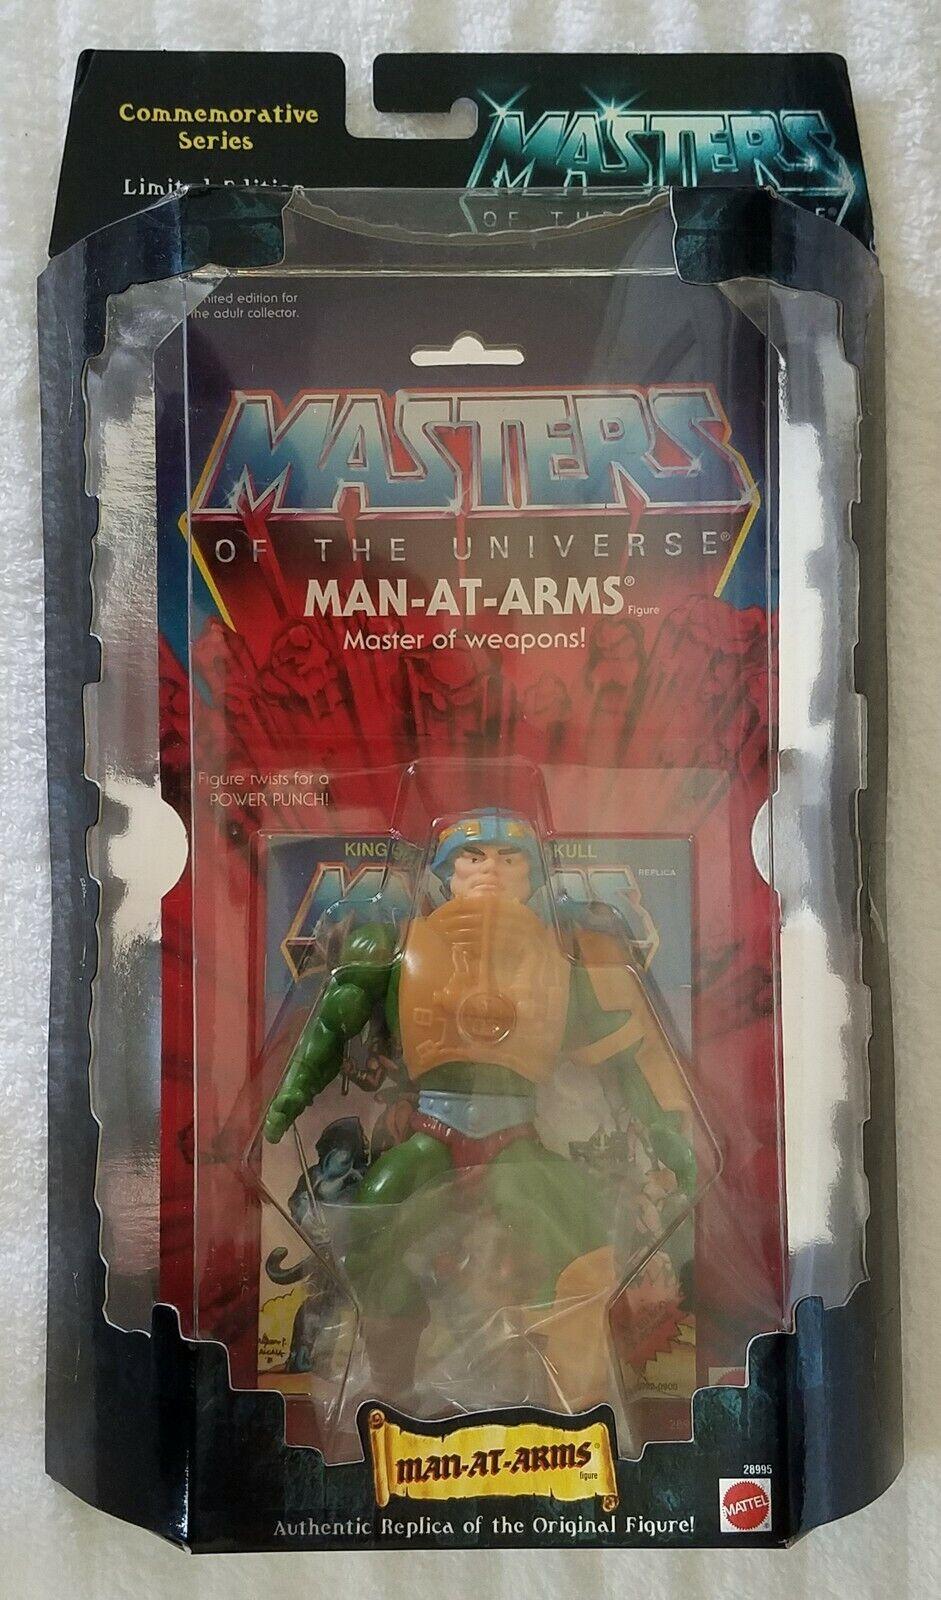 MASTERS OF THE UNIVERSE MAN-AT-ARMS MAN-AT-ARMS MAN-AT-ARMS MASTER OF WEAPONS COMMEMORATIVE SERIES 4d0436